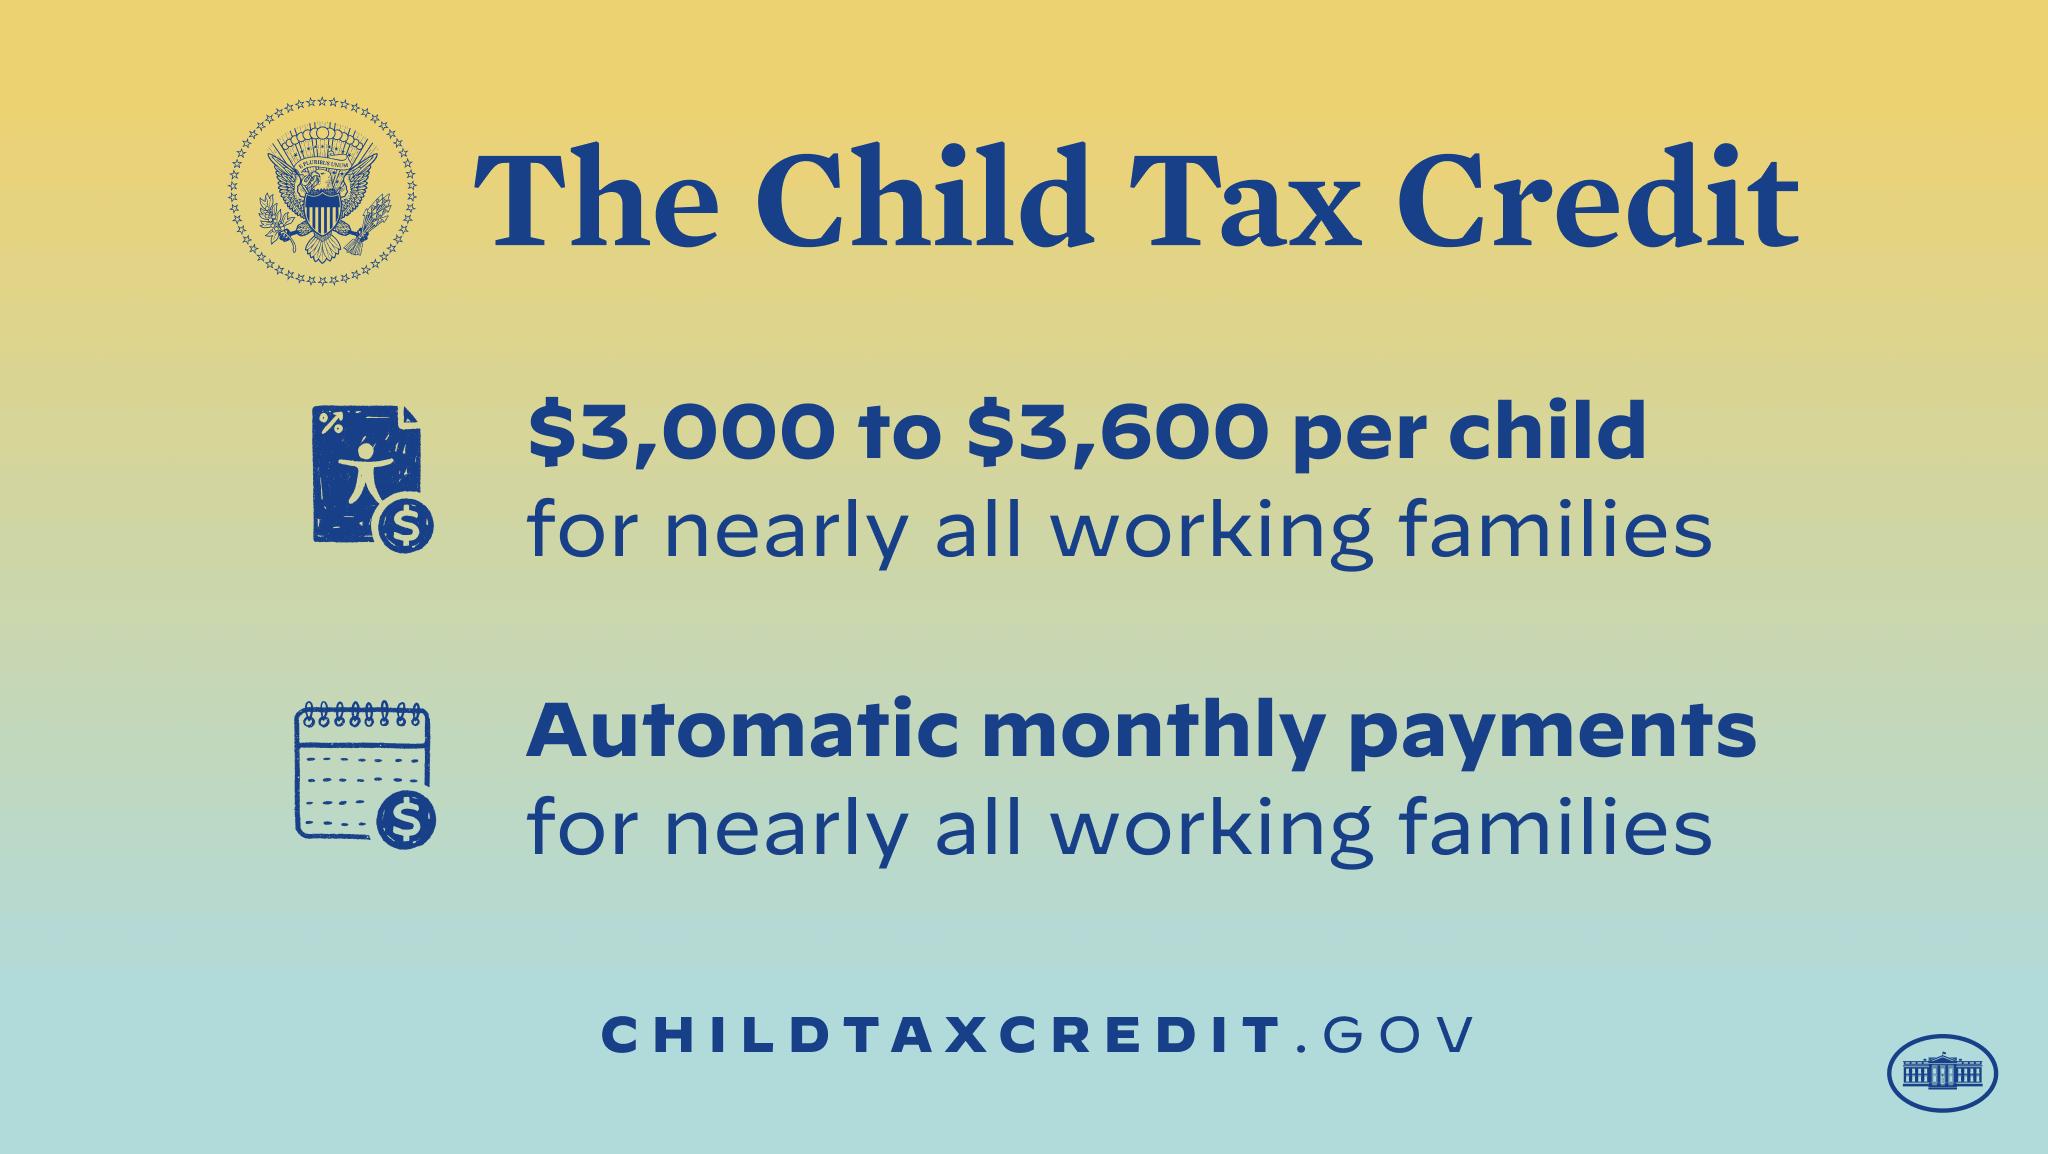 Child Tax Credit Resources